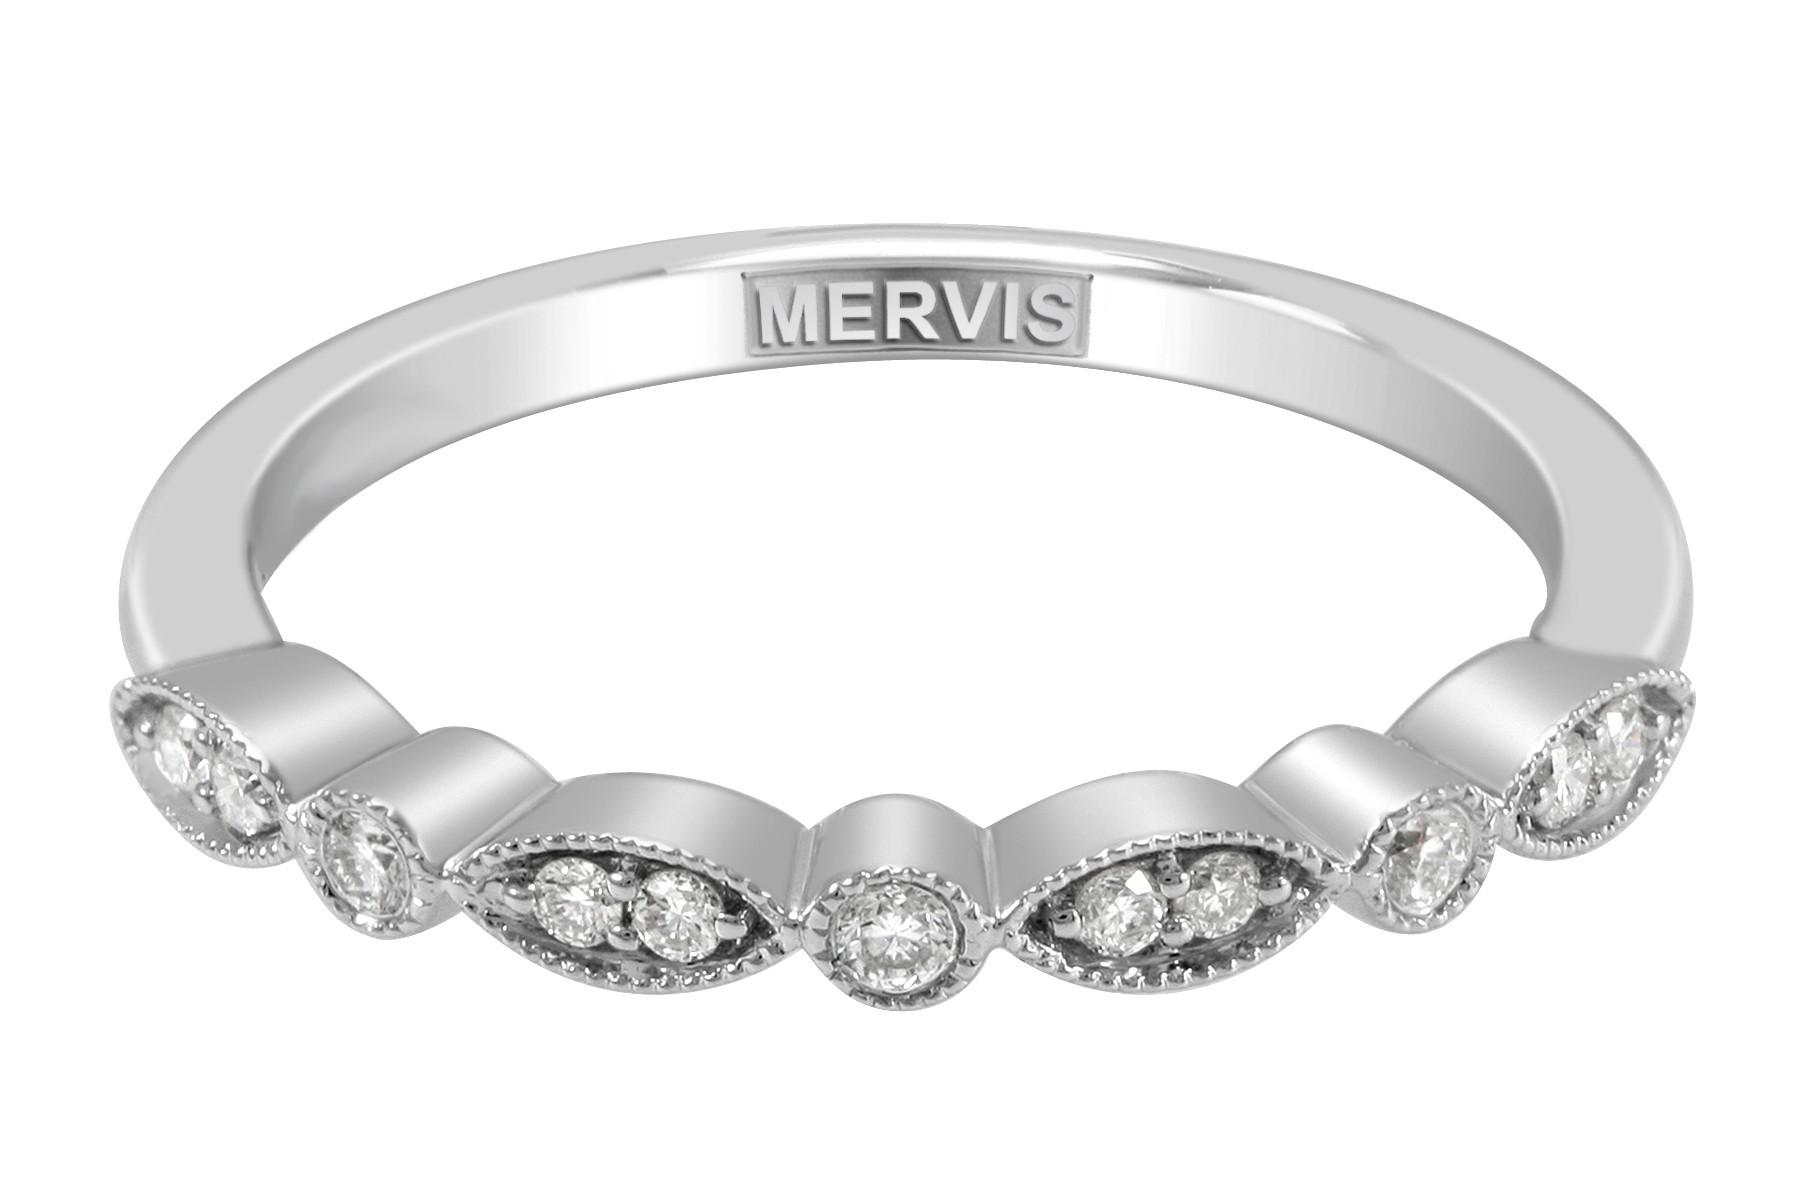 mervis bridal micropave 14k white gold wedding band